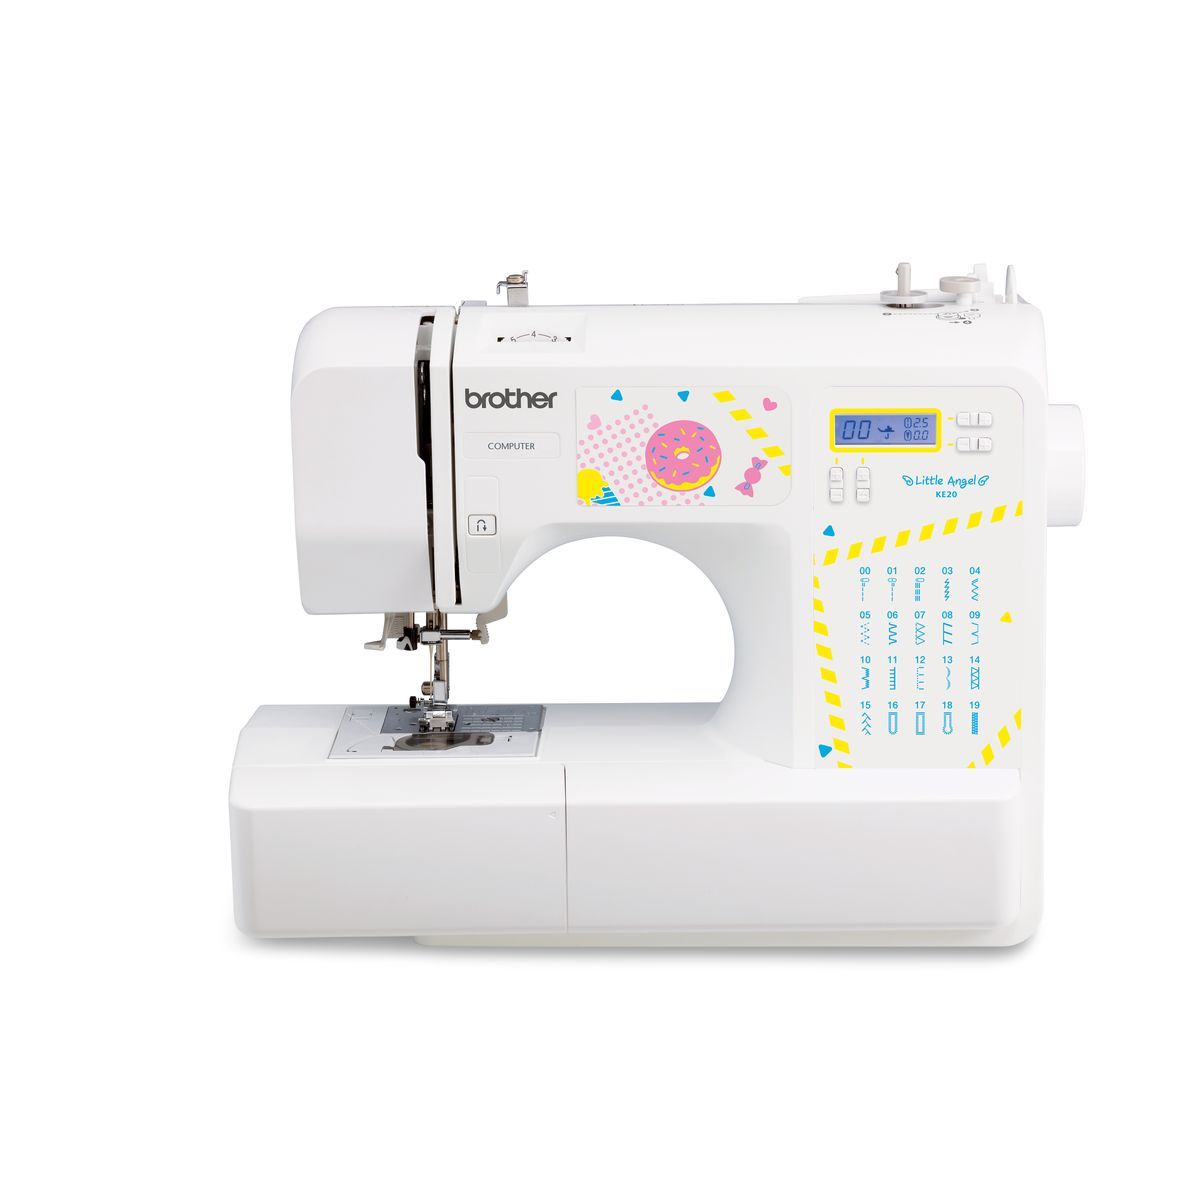 Machine à coudre KE20VM1 - Blanc